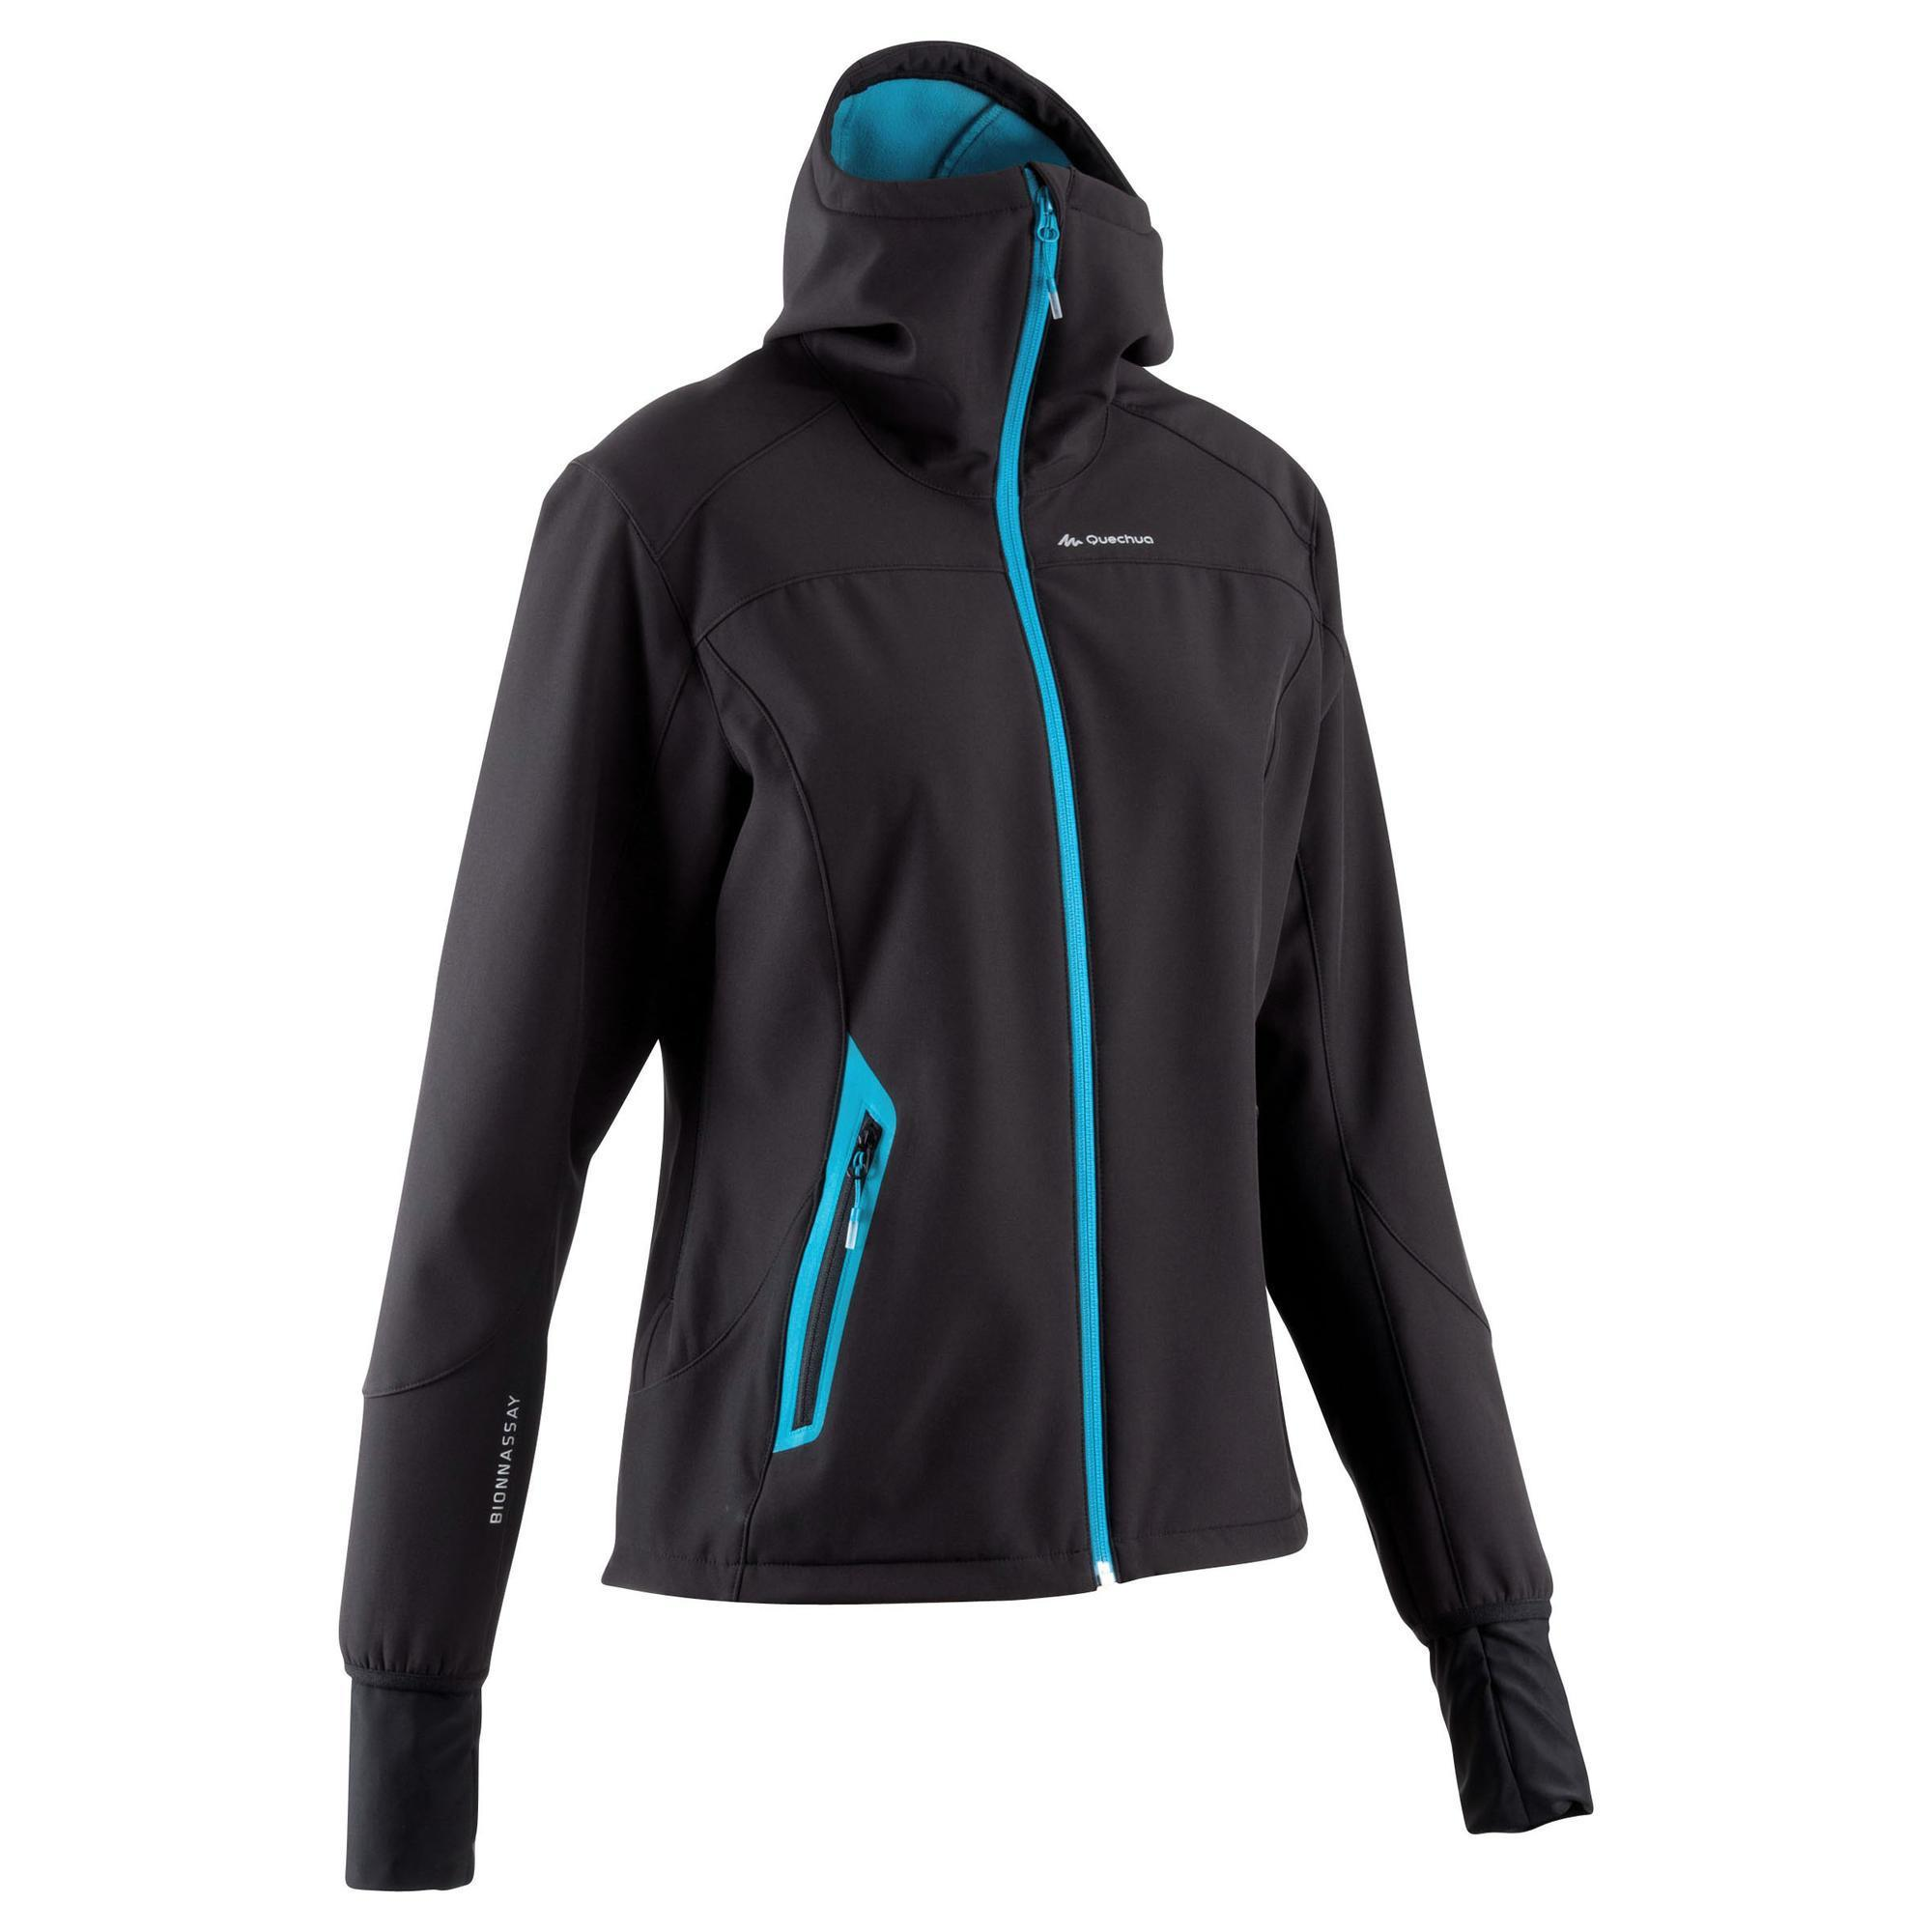 Forclaz 500 Warm Women's Hiking Softshell Jacket